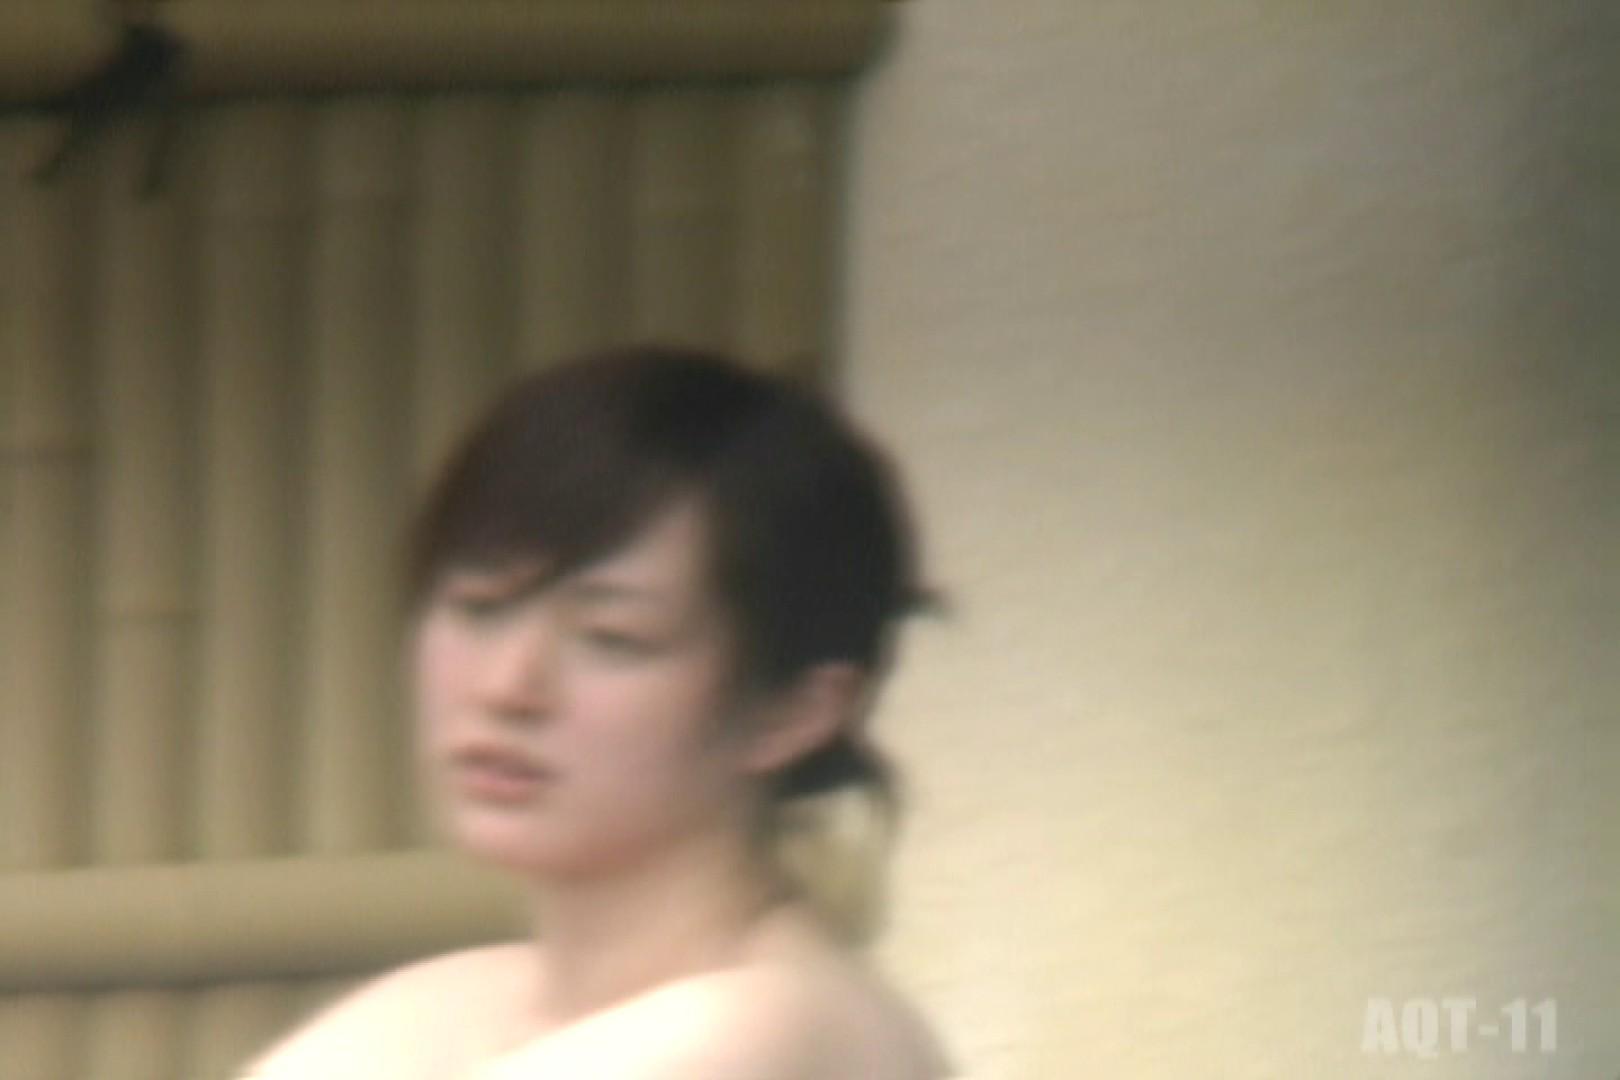 Aquaな露天風呂Vol.798 エッチな盗撮 われめAV動画紹介 109pic 63